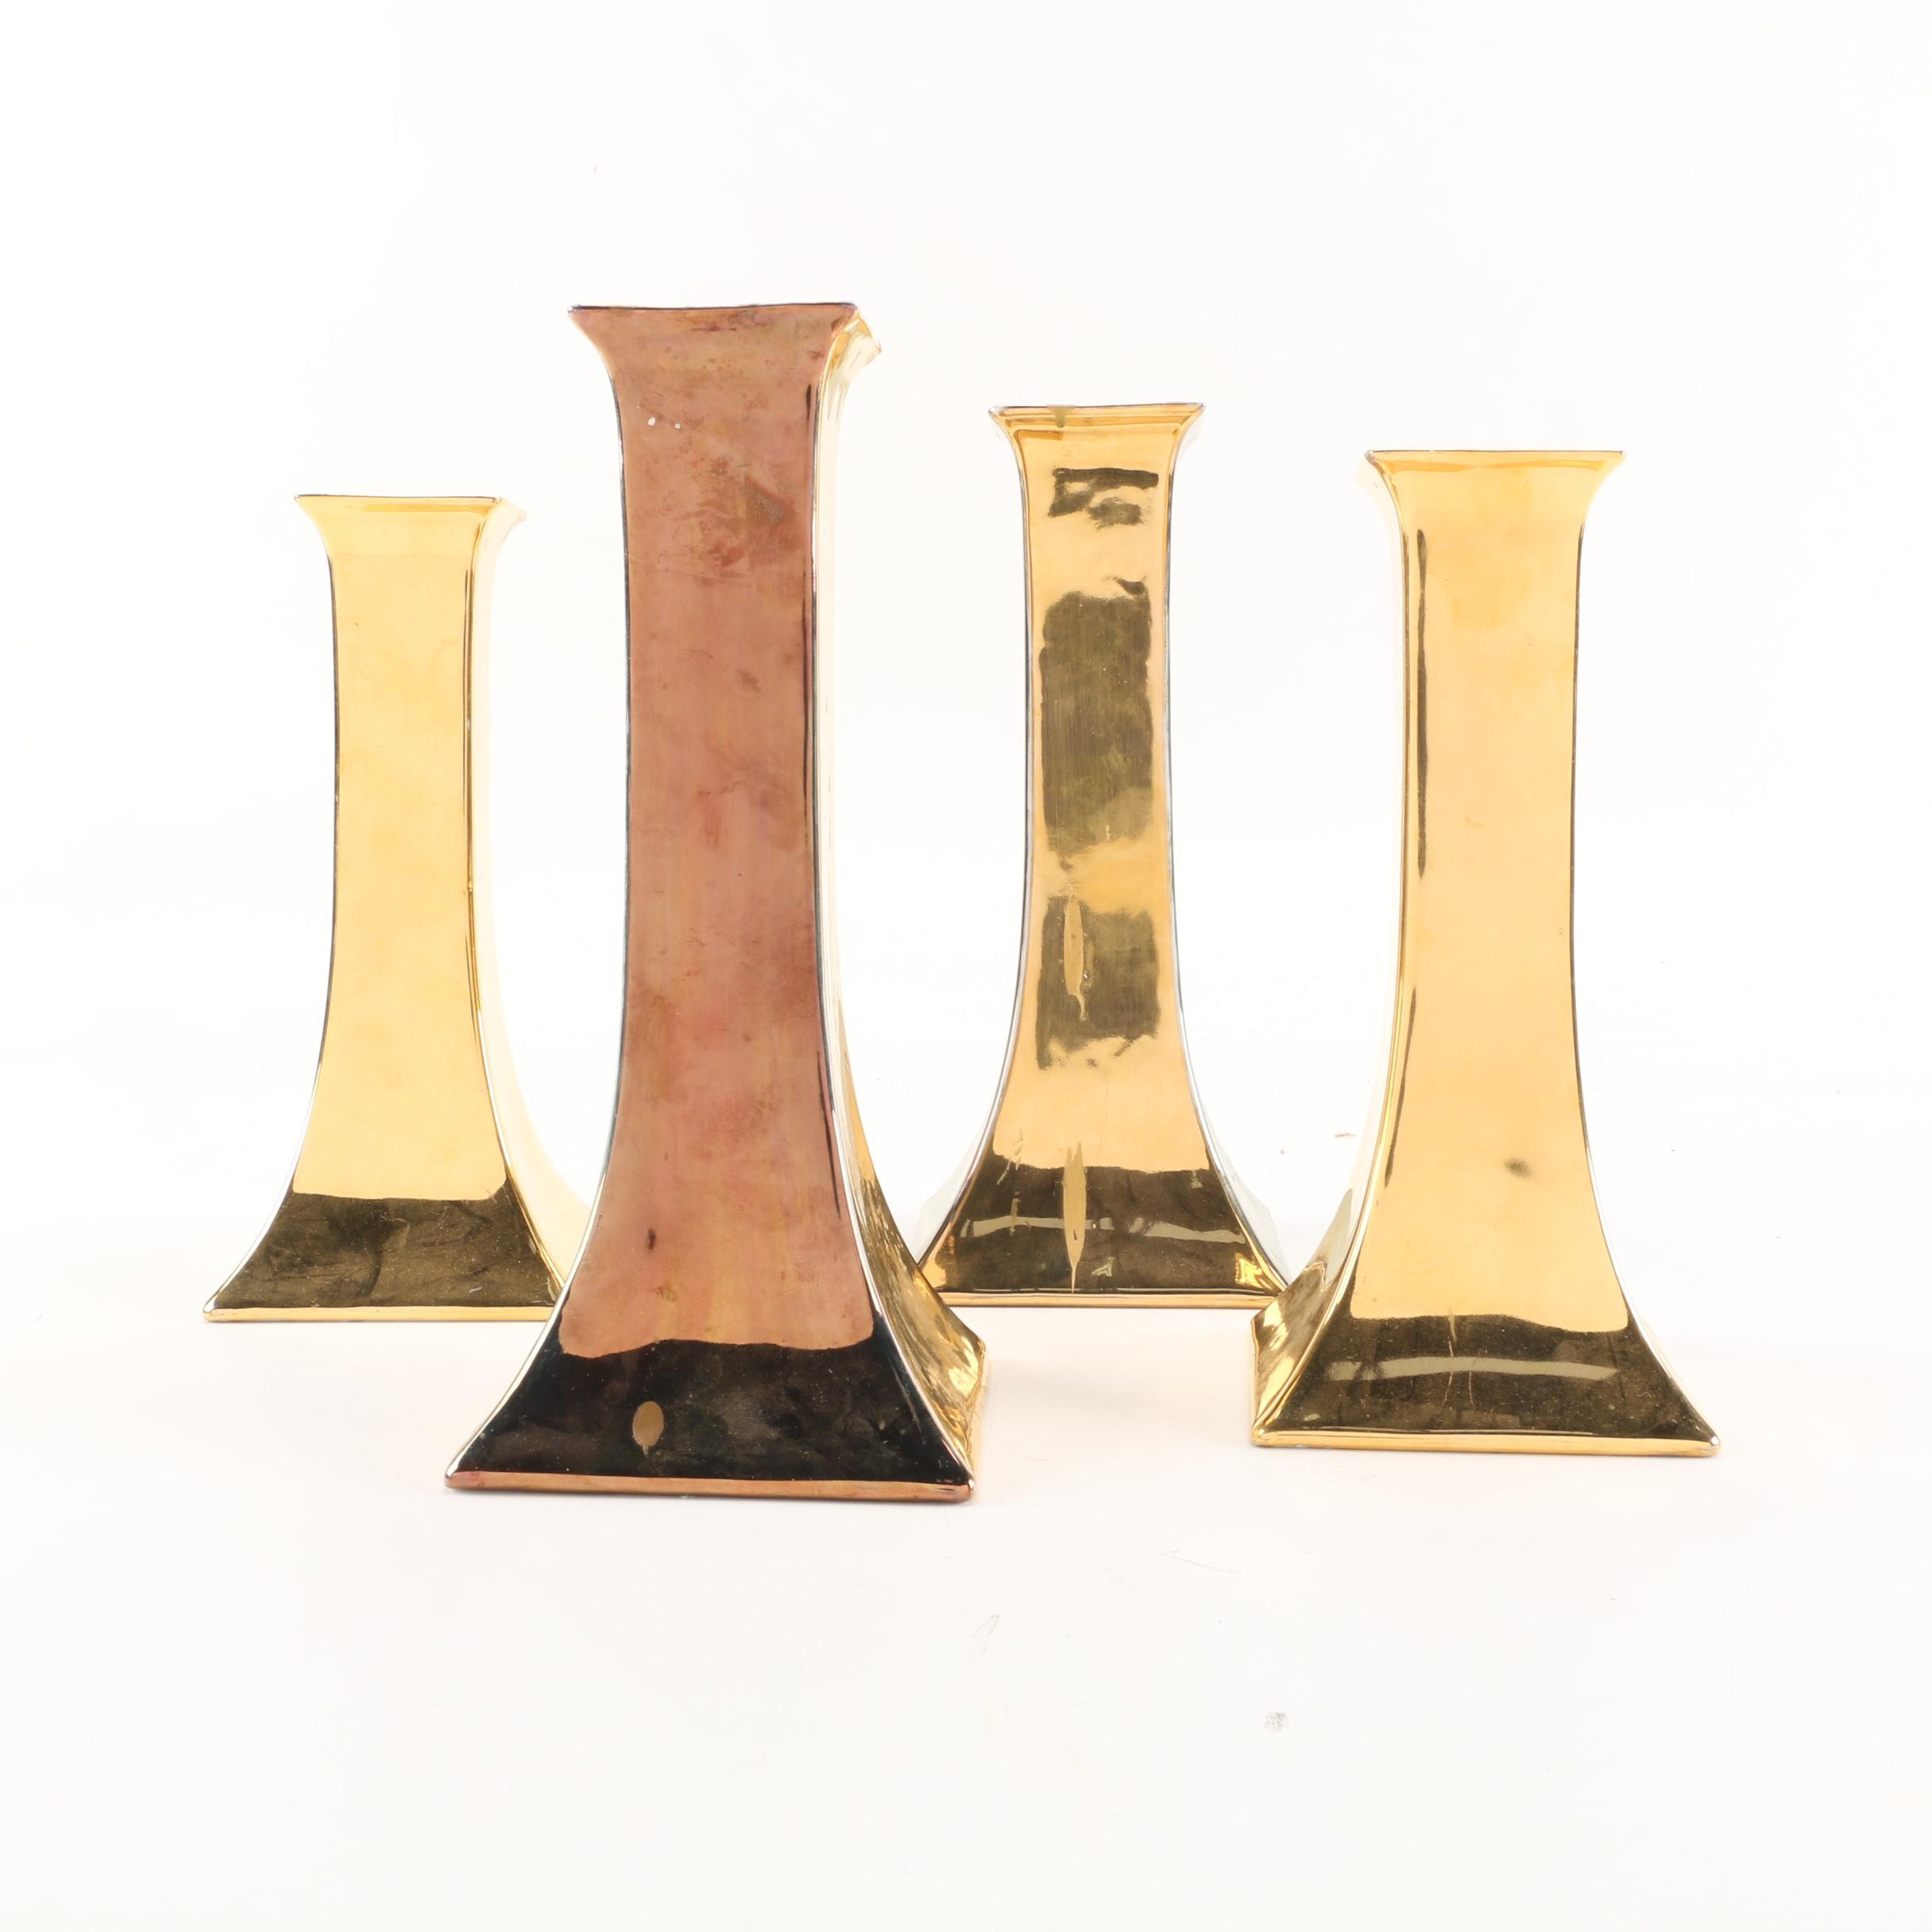 Czechoslovakian Royal Epiag Gold Luster Porcelain Candlestick Holders